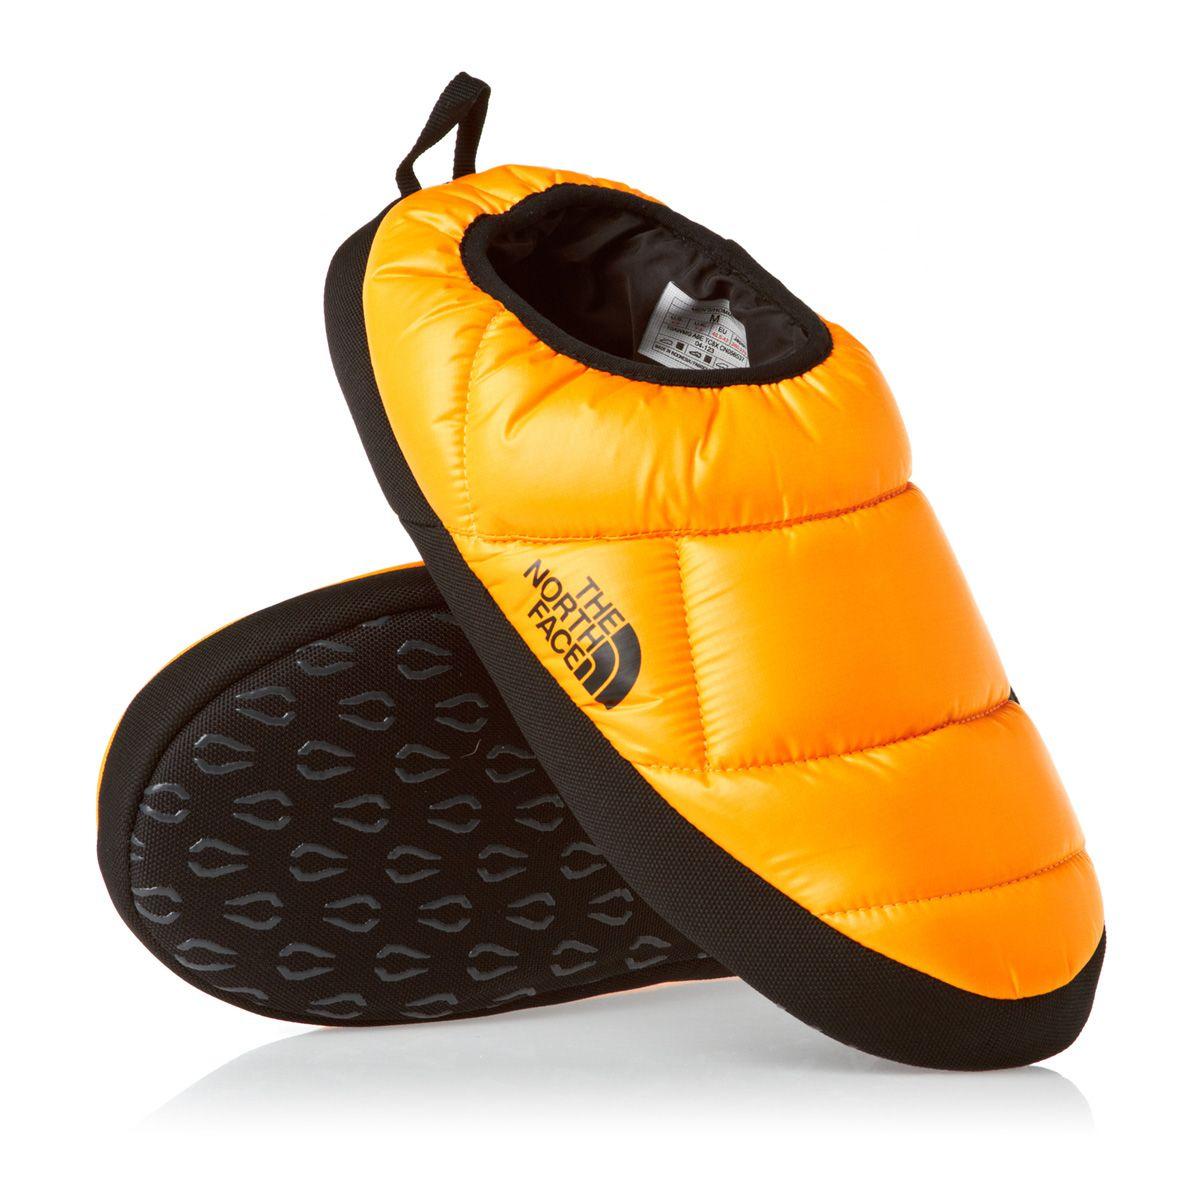 North face nuptse  sc 1 st  Pinterest & The North Face slippers | Menswear | Pinterest | North face nuptse